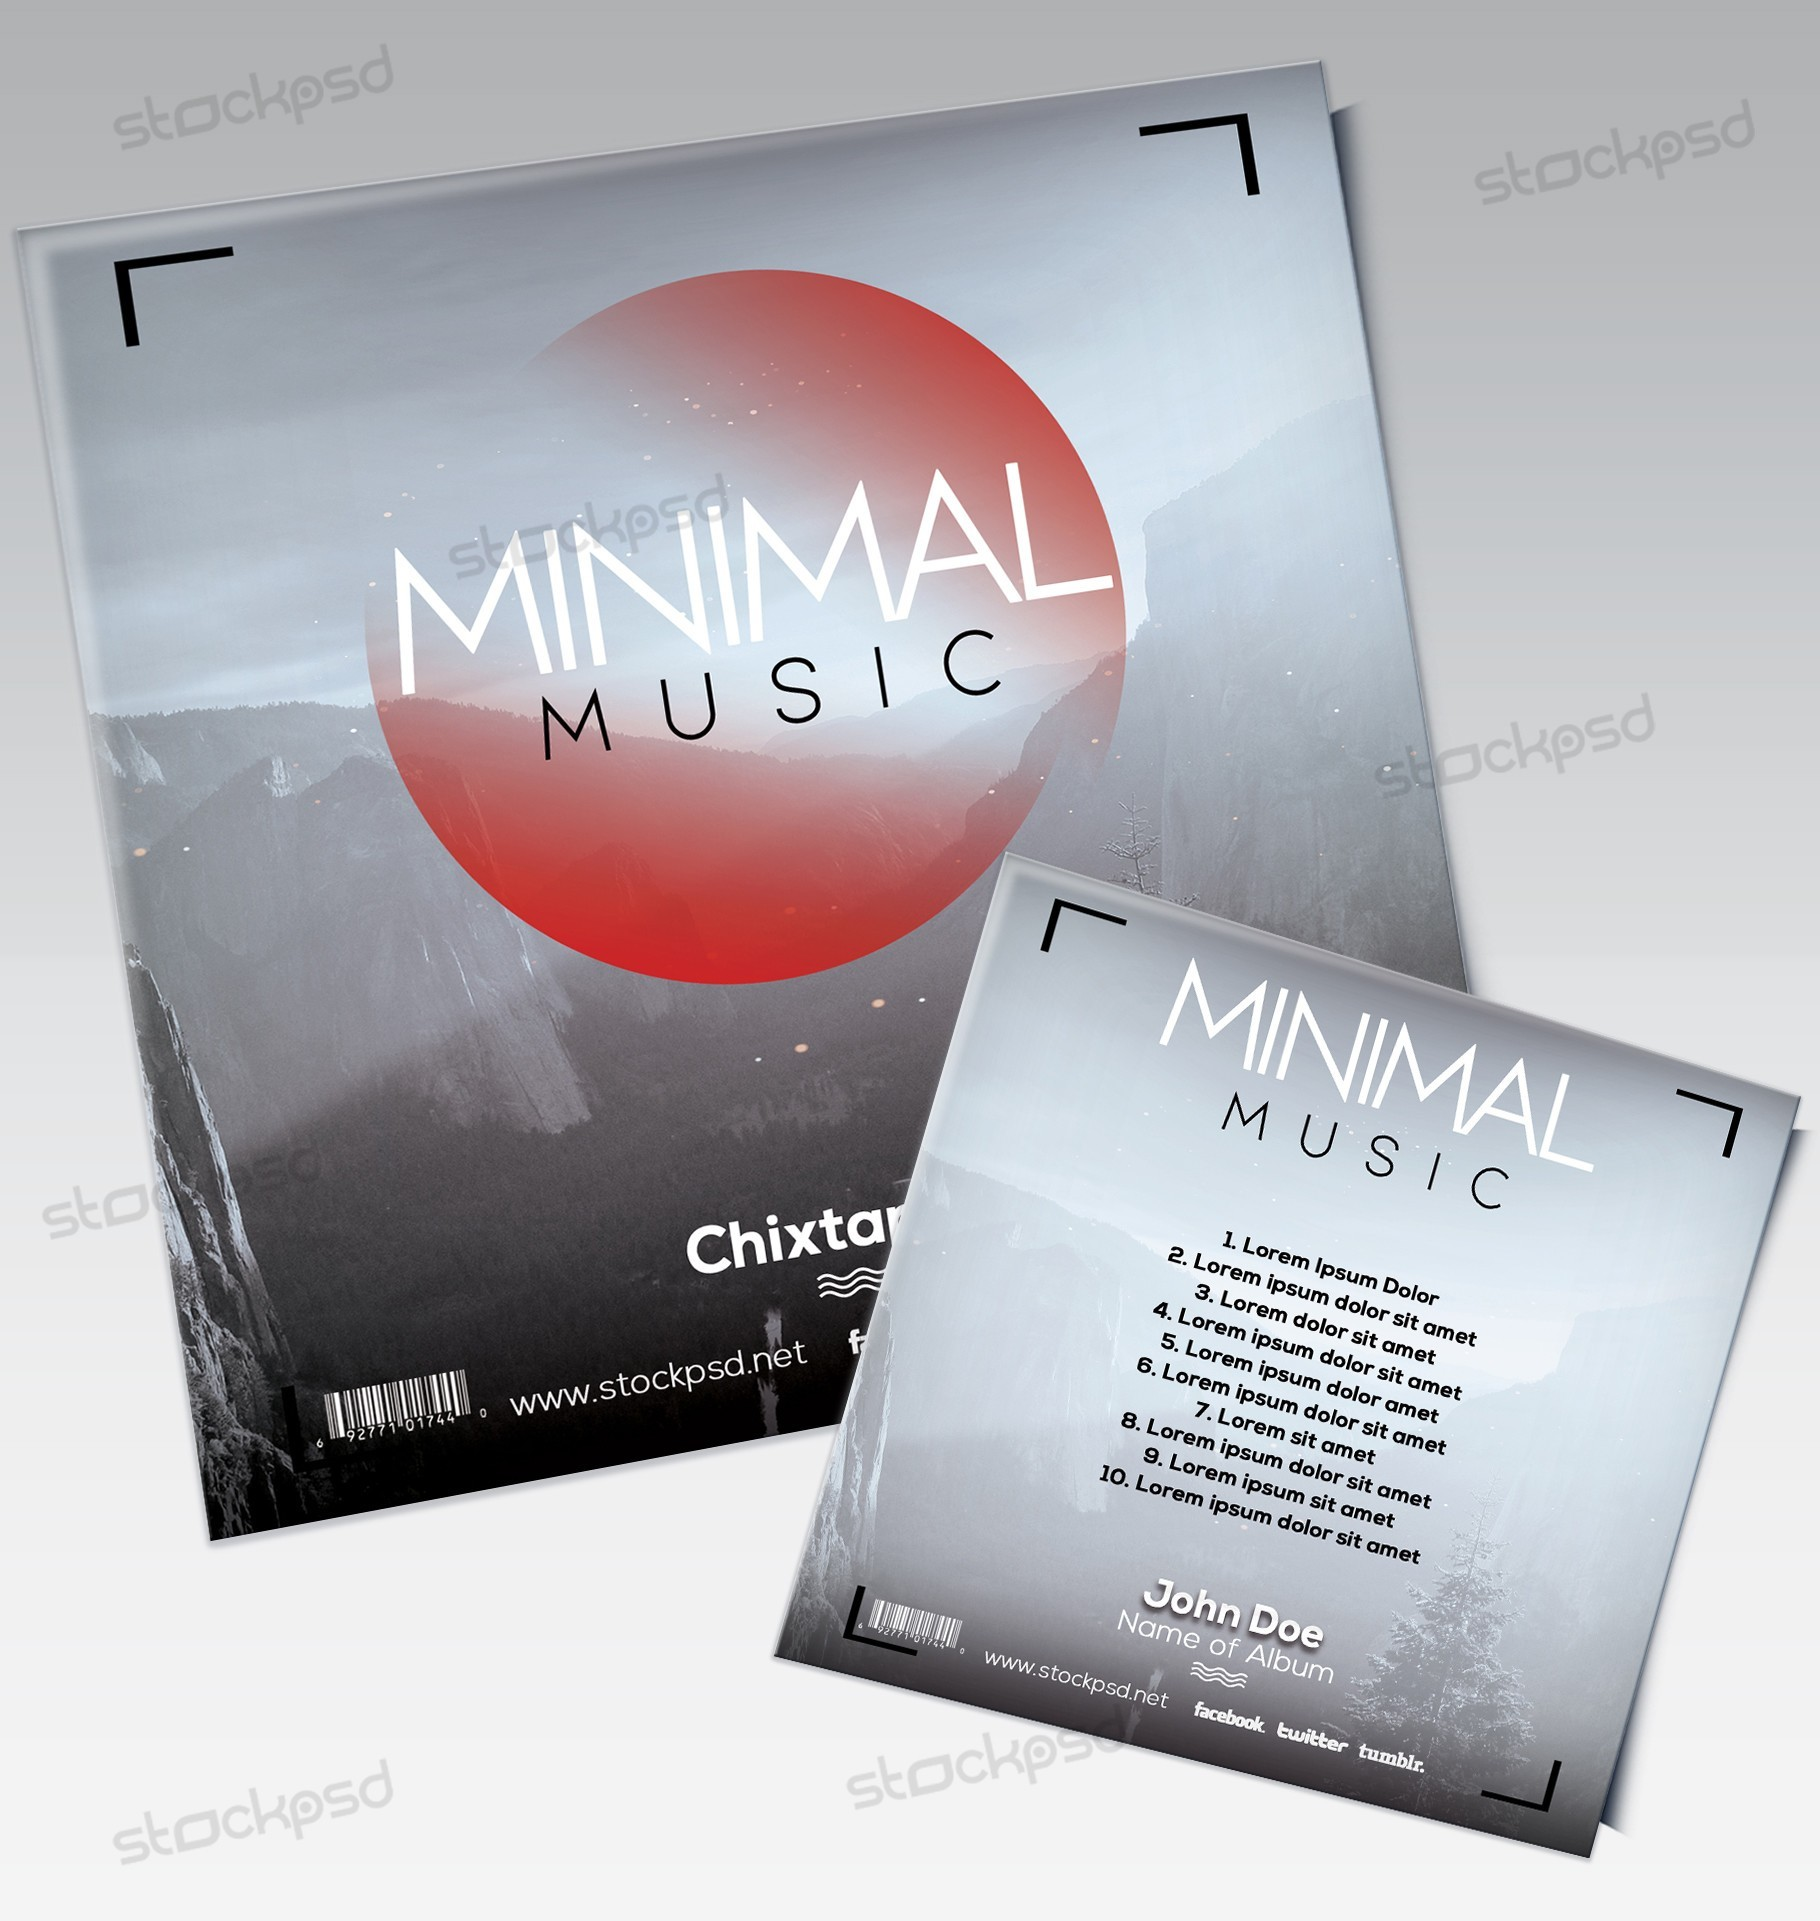 Minimal Music - Mixtape Cover Artwork PSD Template - Free PSD Flyer